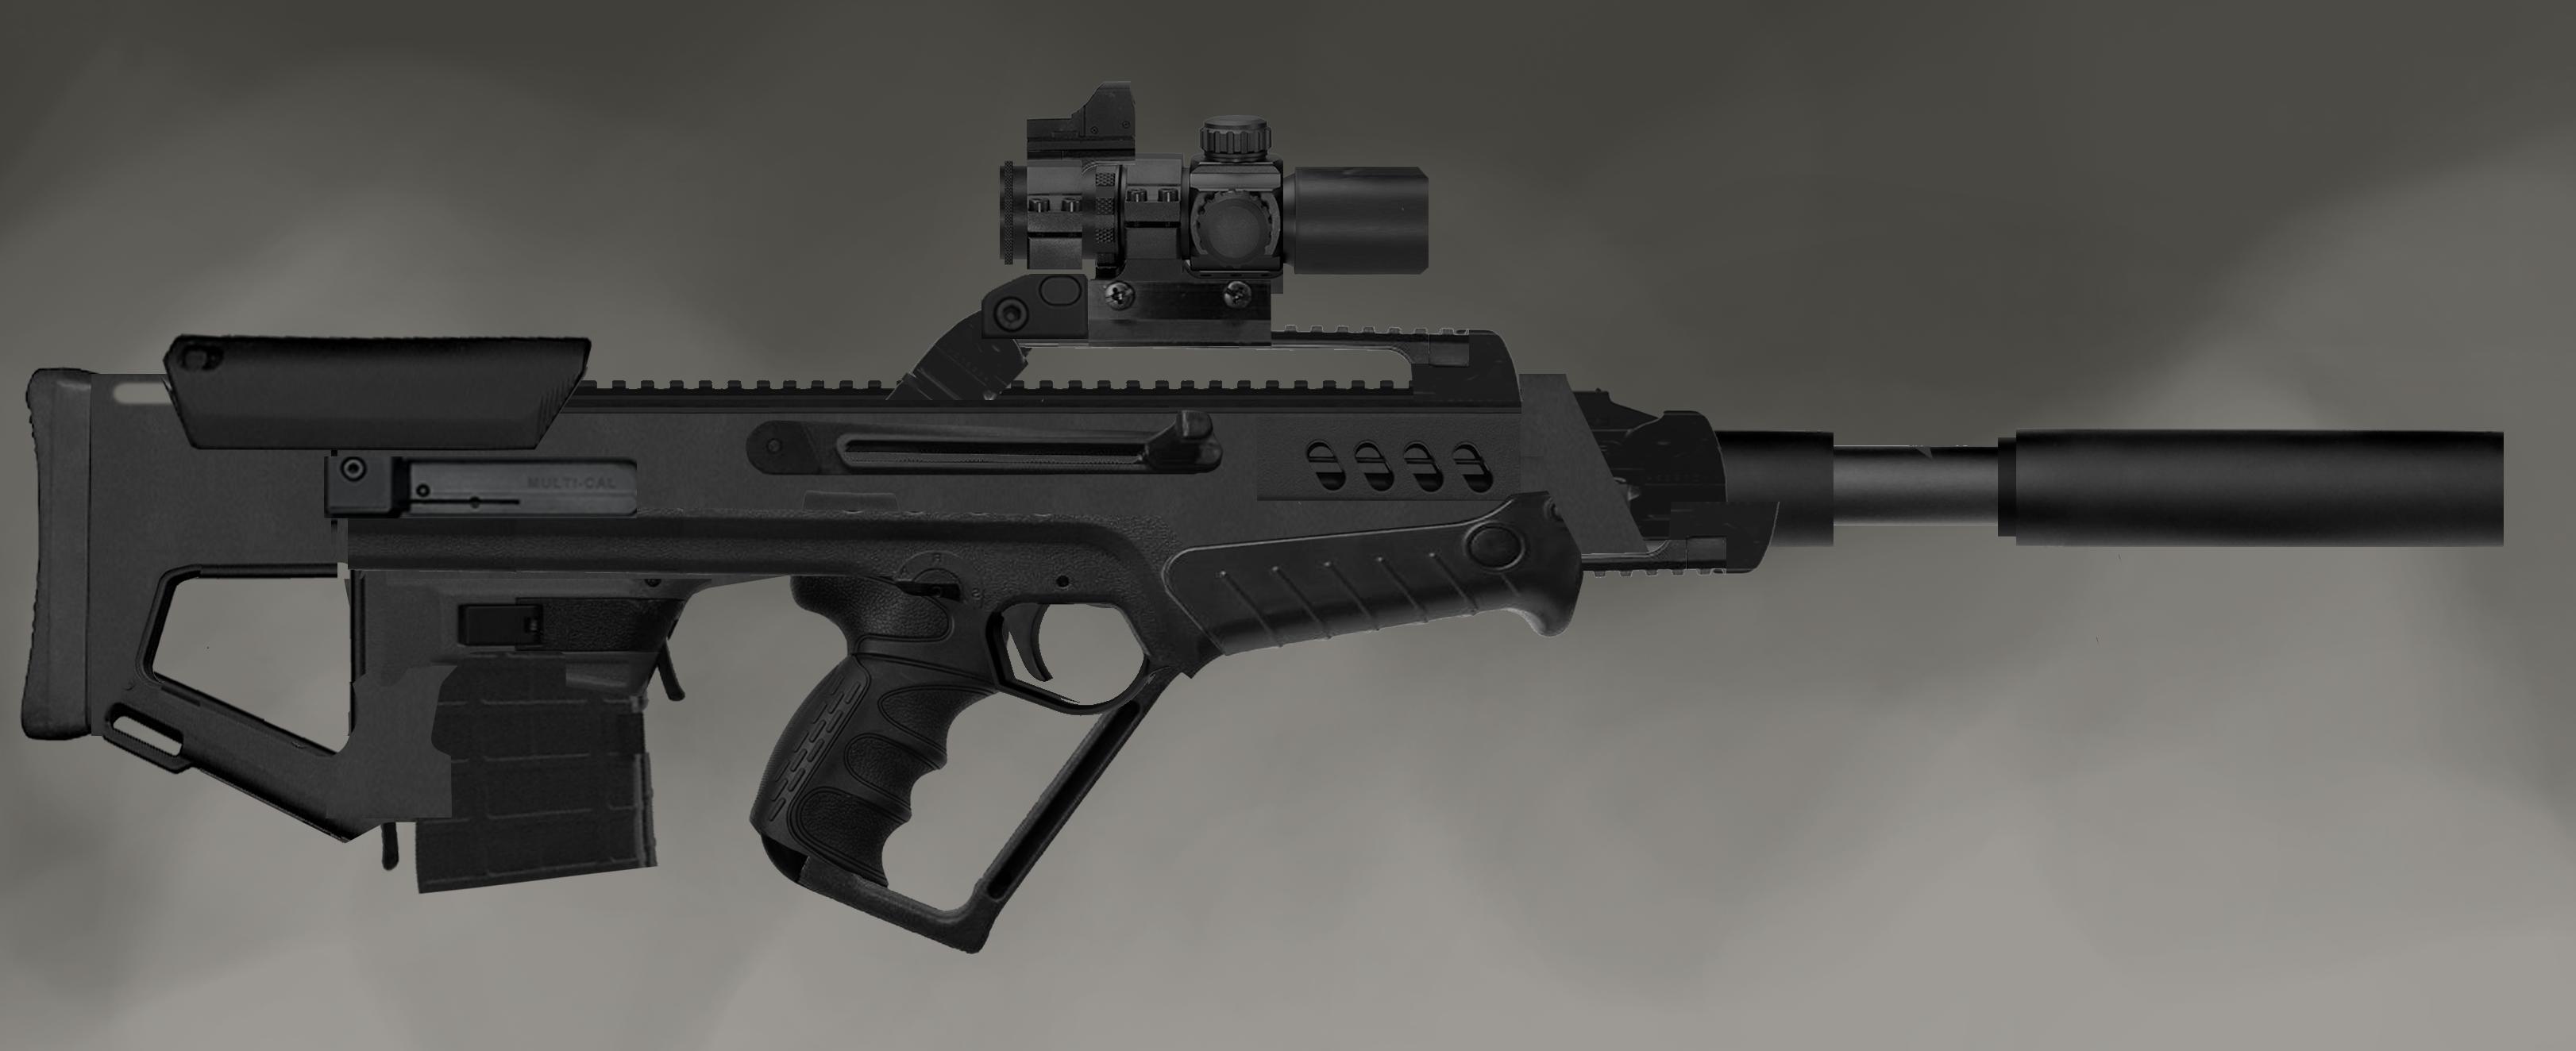 sniper rifle concept image - orbital assault